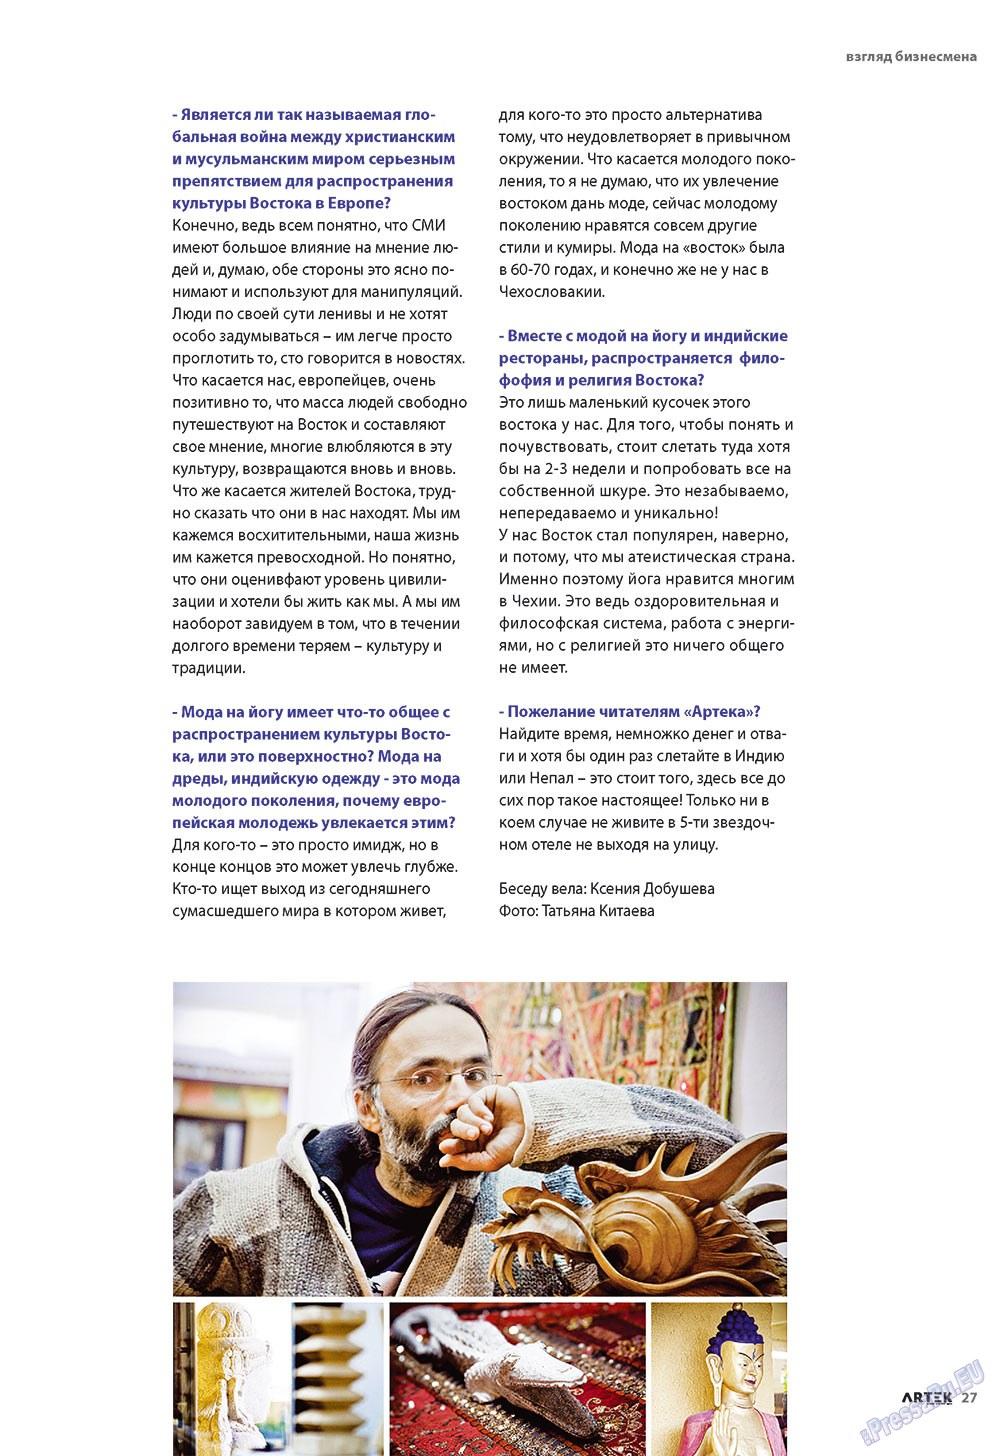 Артек (журнал). 2009 год, номер 5, стр. 27